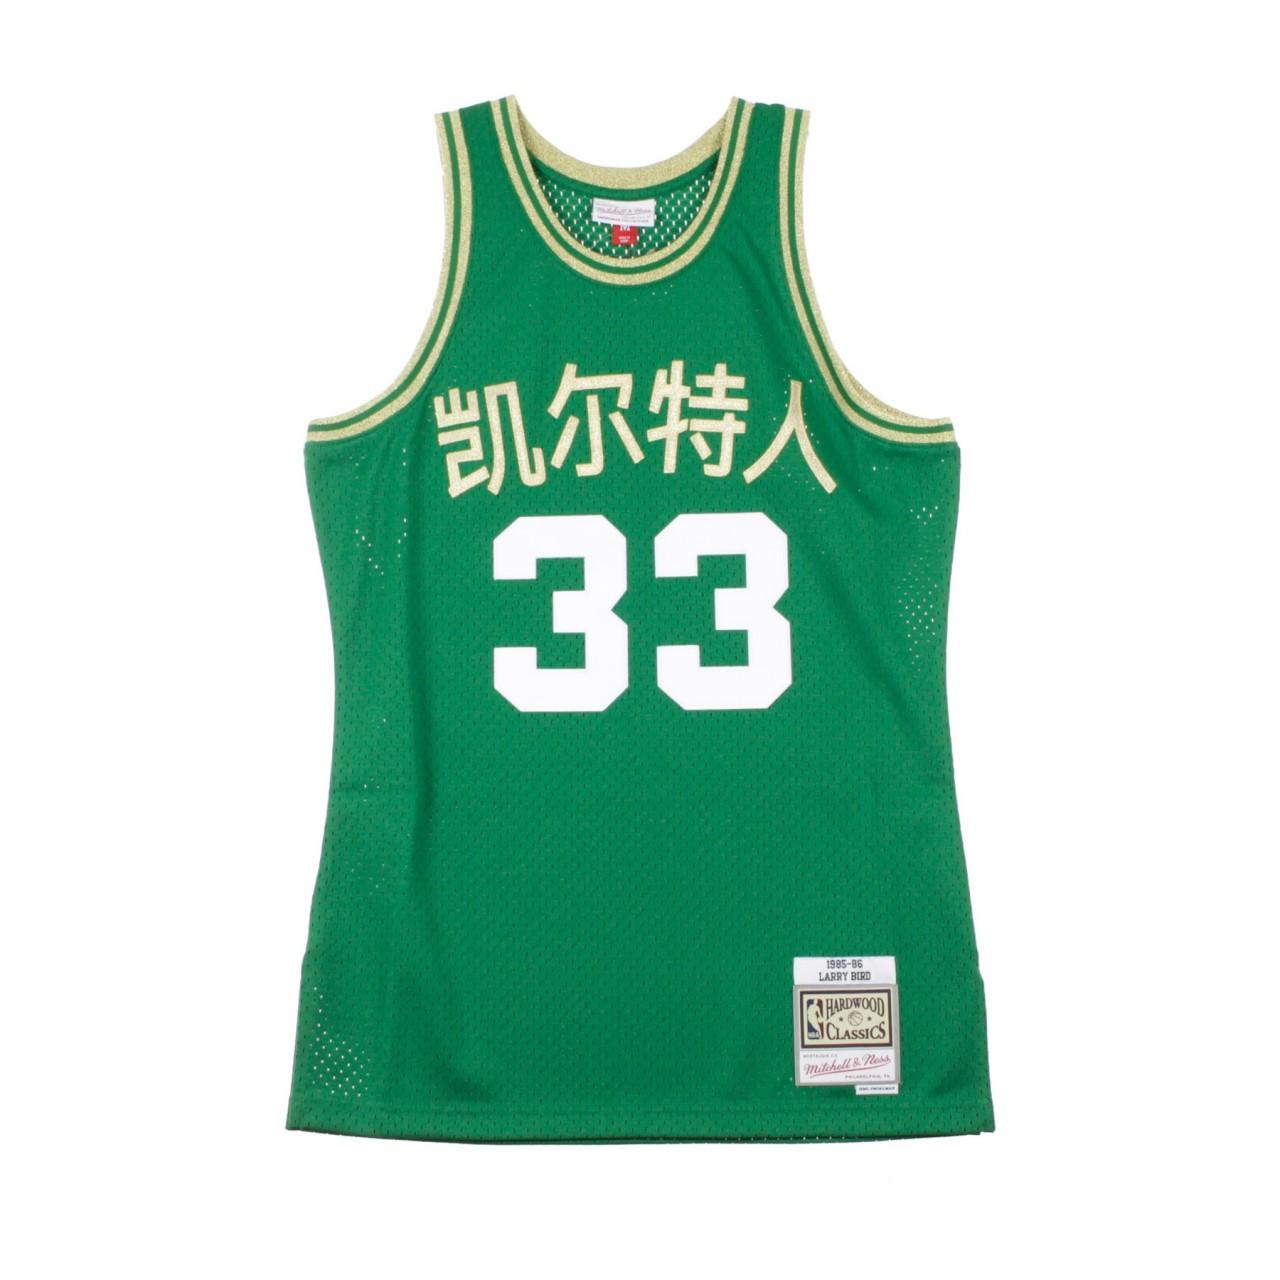 MITCHELL & NESS NBA CHINESE NEW YEAR EDITION SWINGMAN JERSEY LARRY BIRD NO.33 1985-86 BOSCEL ROAD SMJYNG18393-BCEGREN85LBI